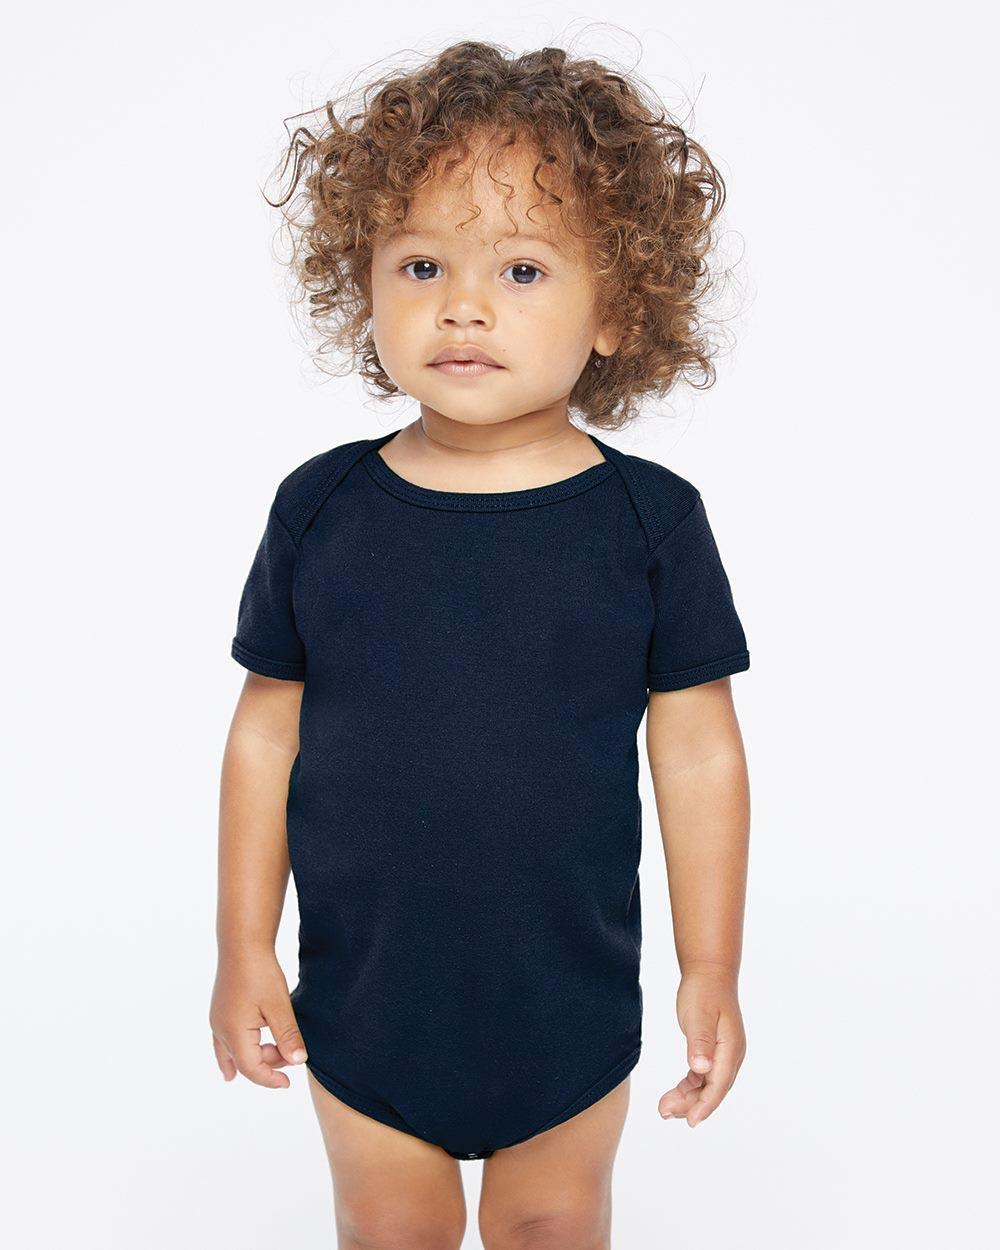 American Apparel 4001W - Infant Baby Rib Onesie